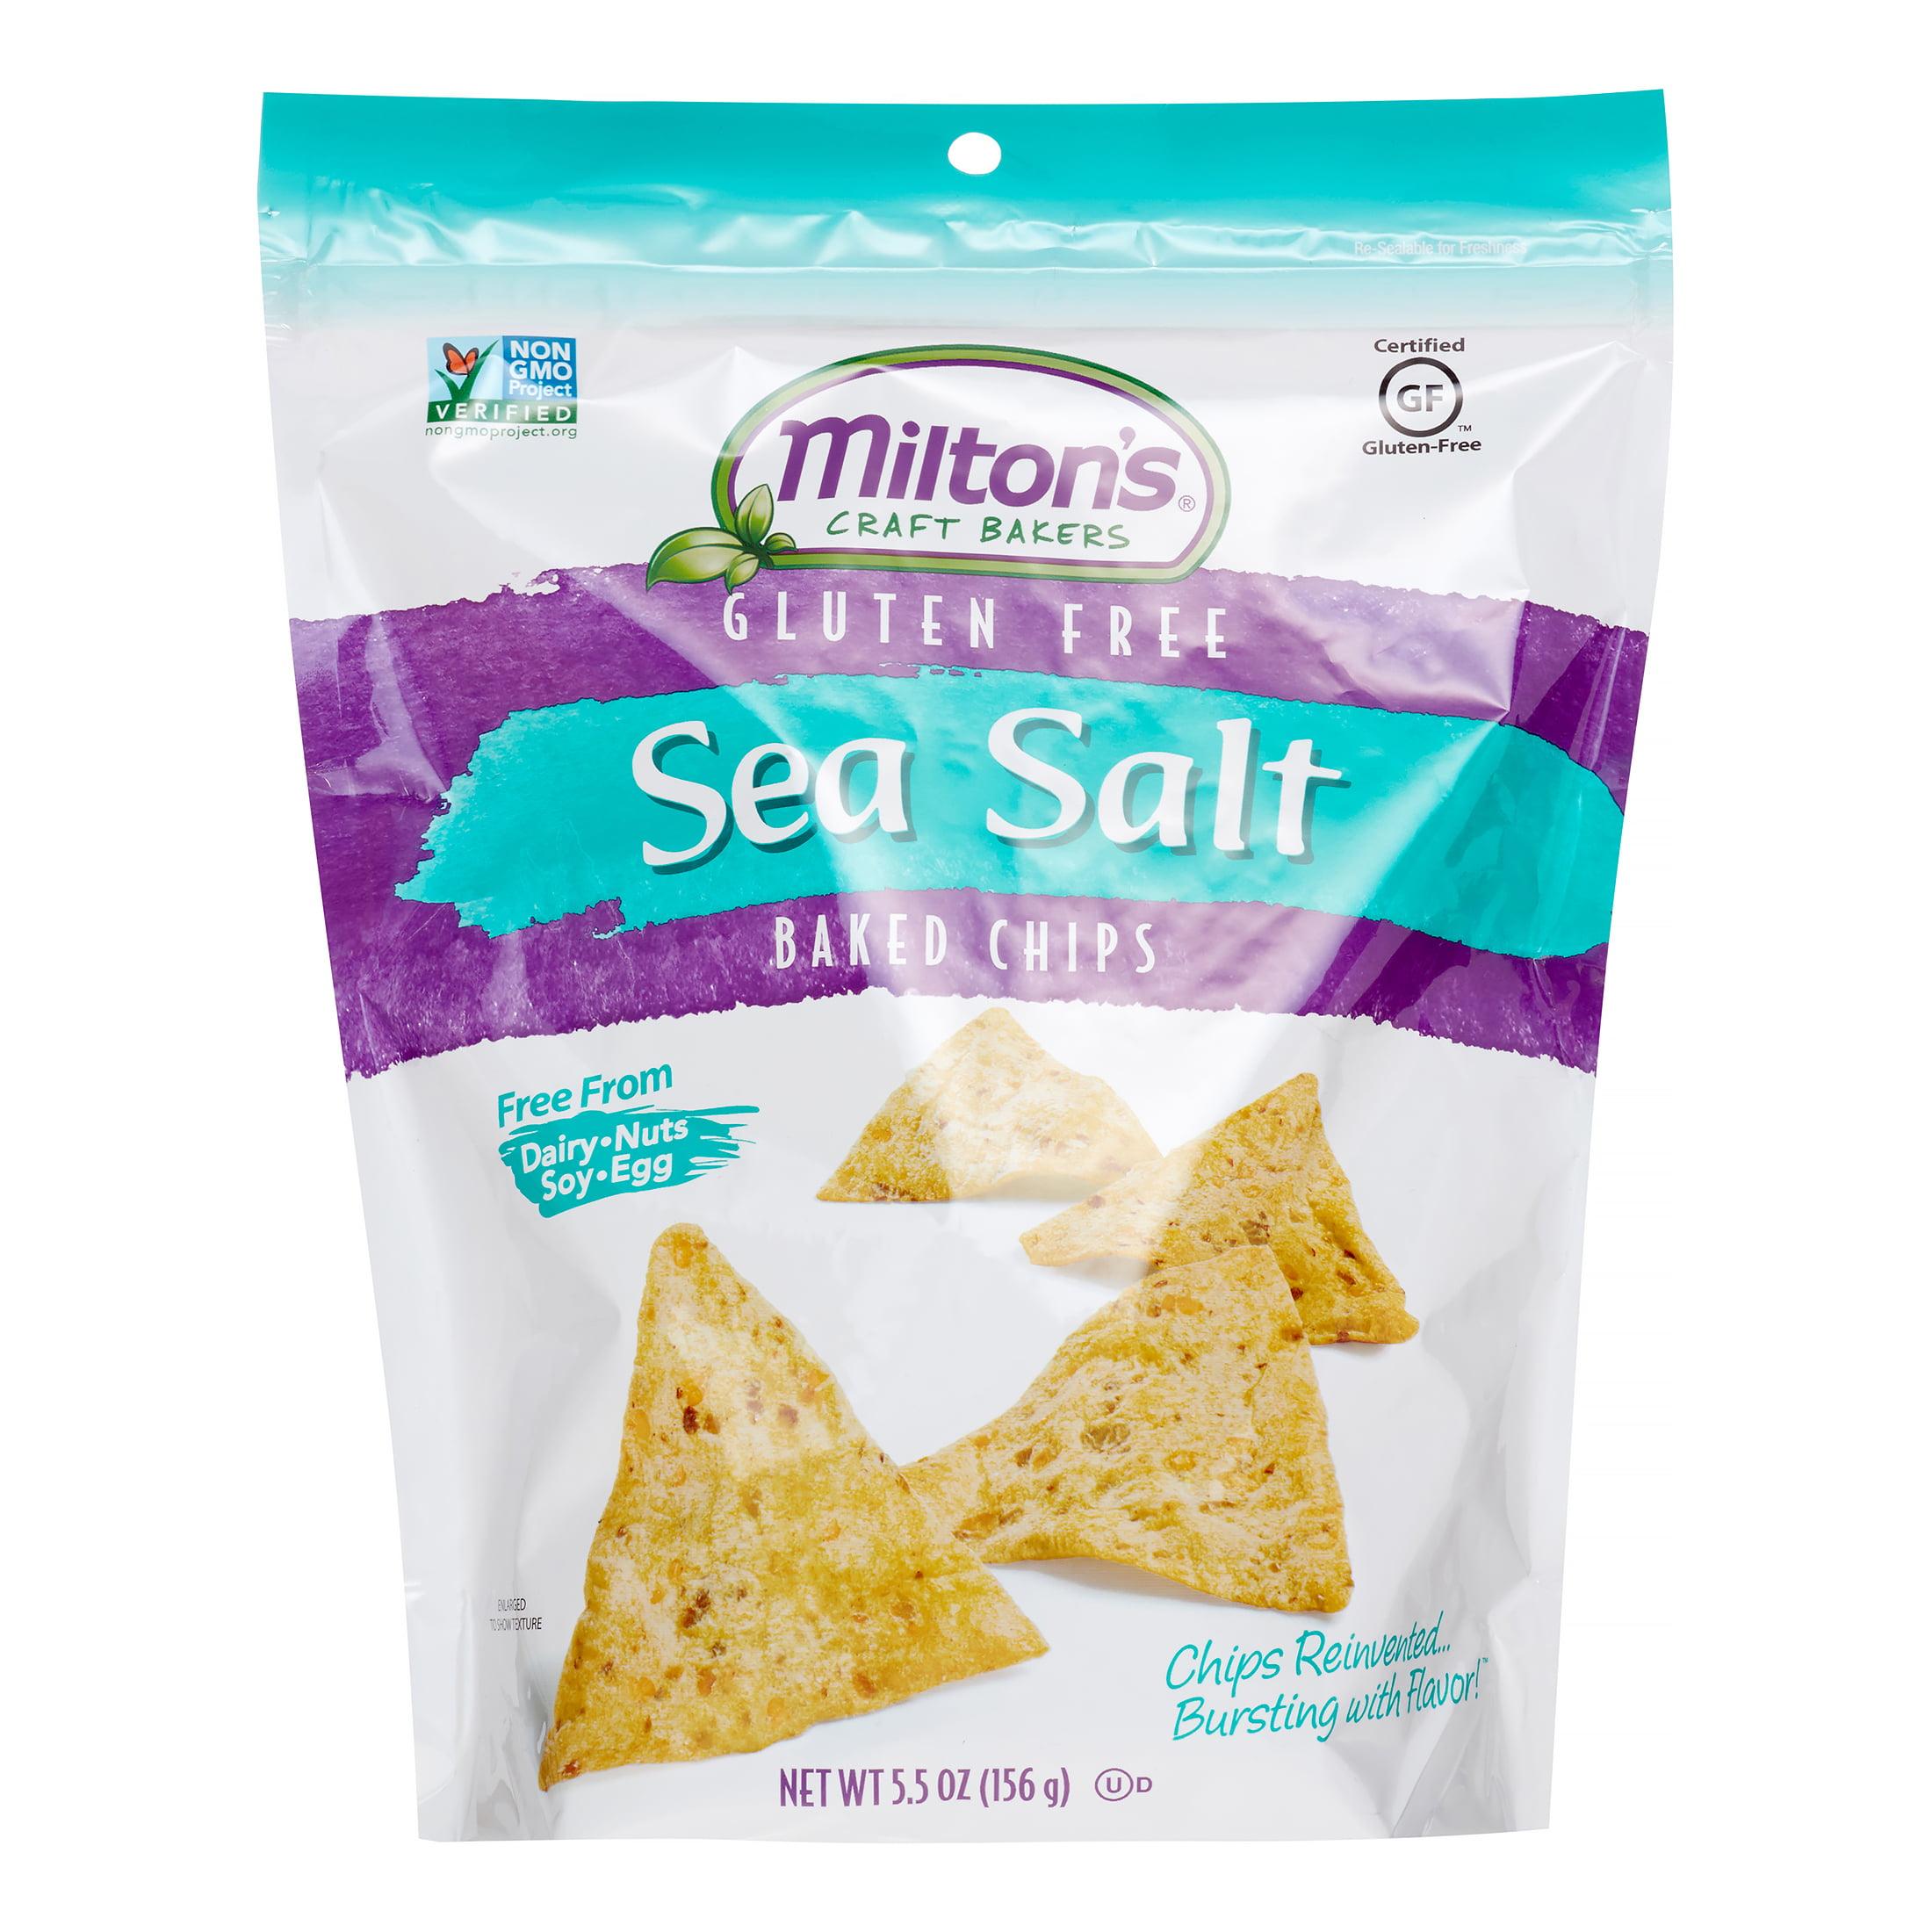 Miltons Milton's Craft Bakers Gluten Free Sea Salt Baked Chips, 5.5 Oz